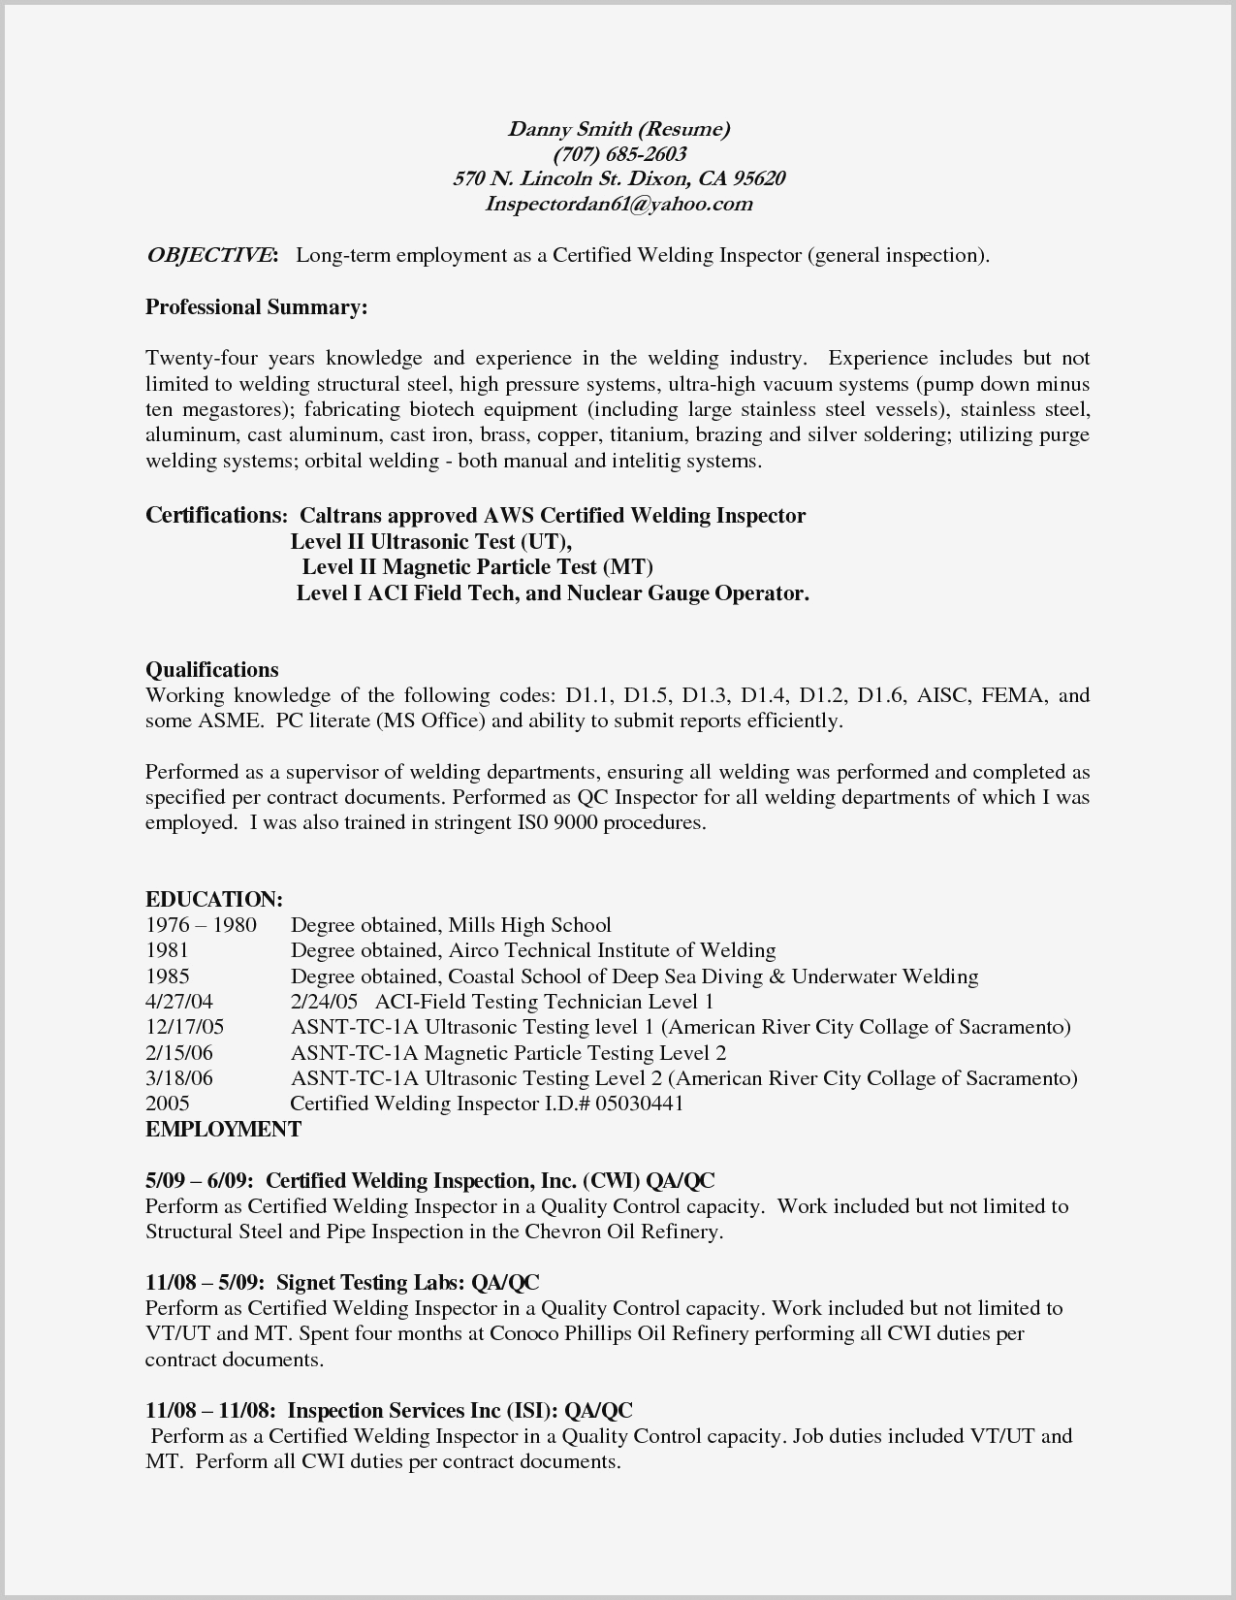 Welder Fabricator Resume Sample Best Of 76 Fabricator Resume Welder Fabricator Resume Top 10 Job Resume Examples Professional Resume Examples Resume Examples